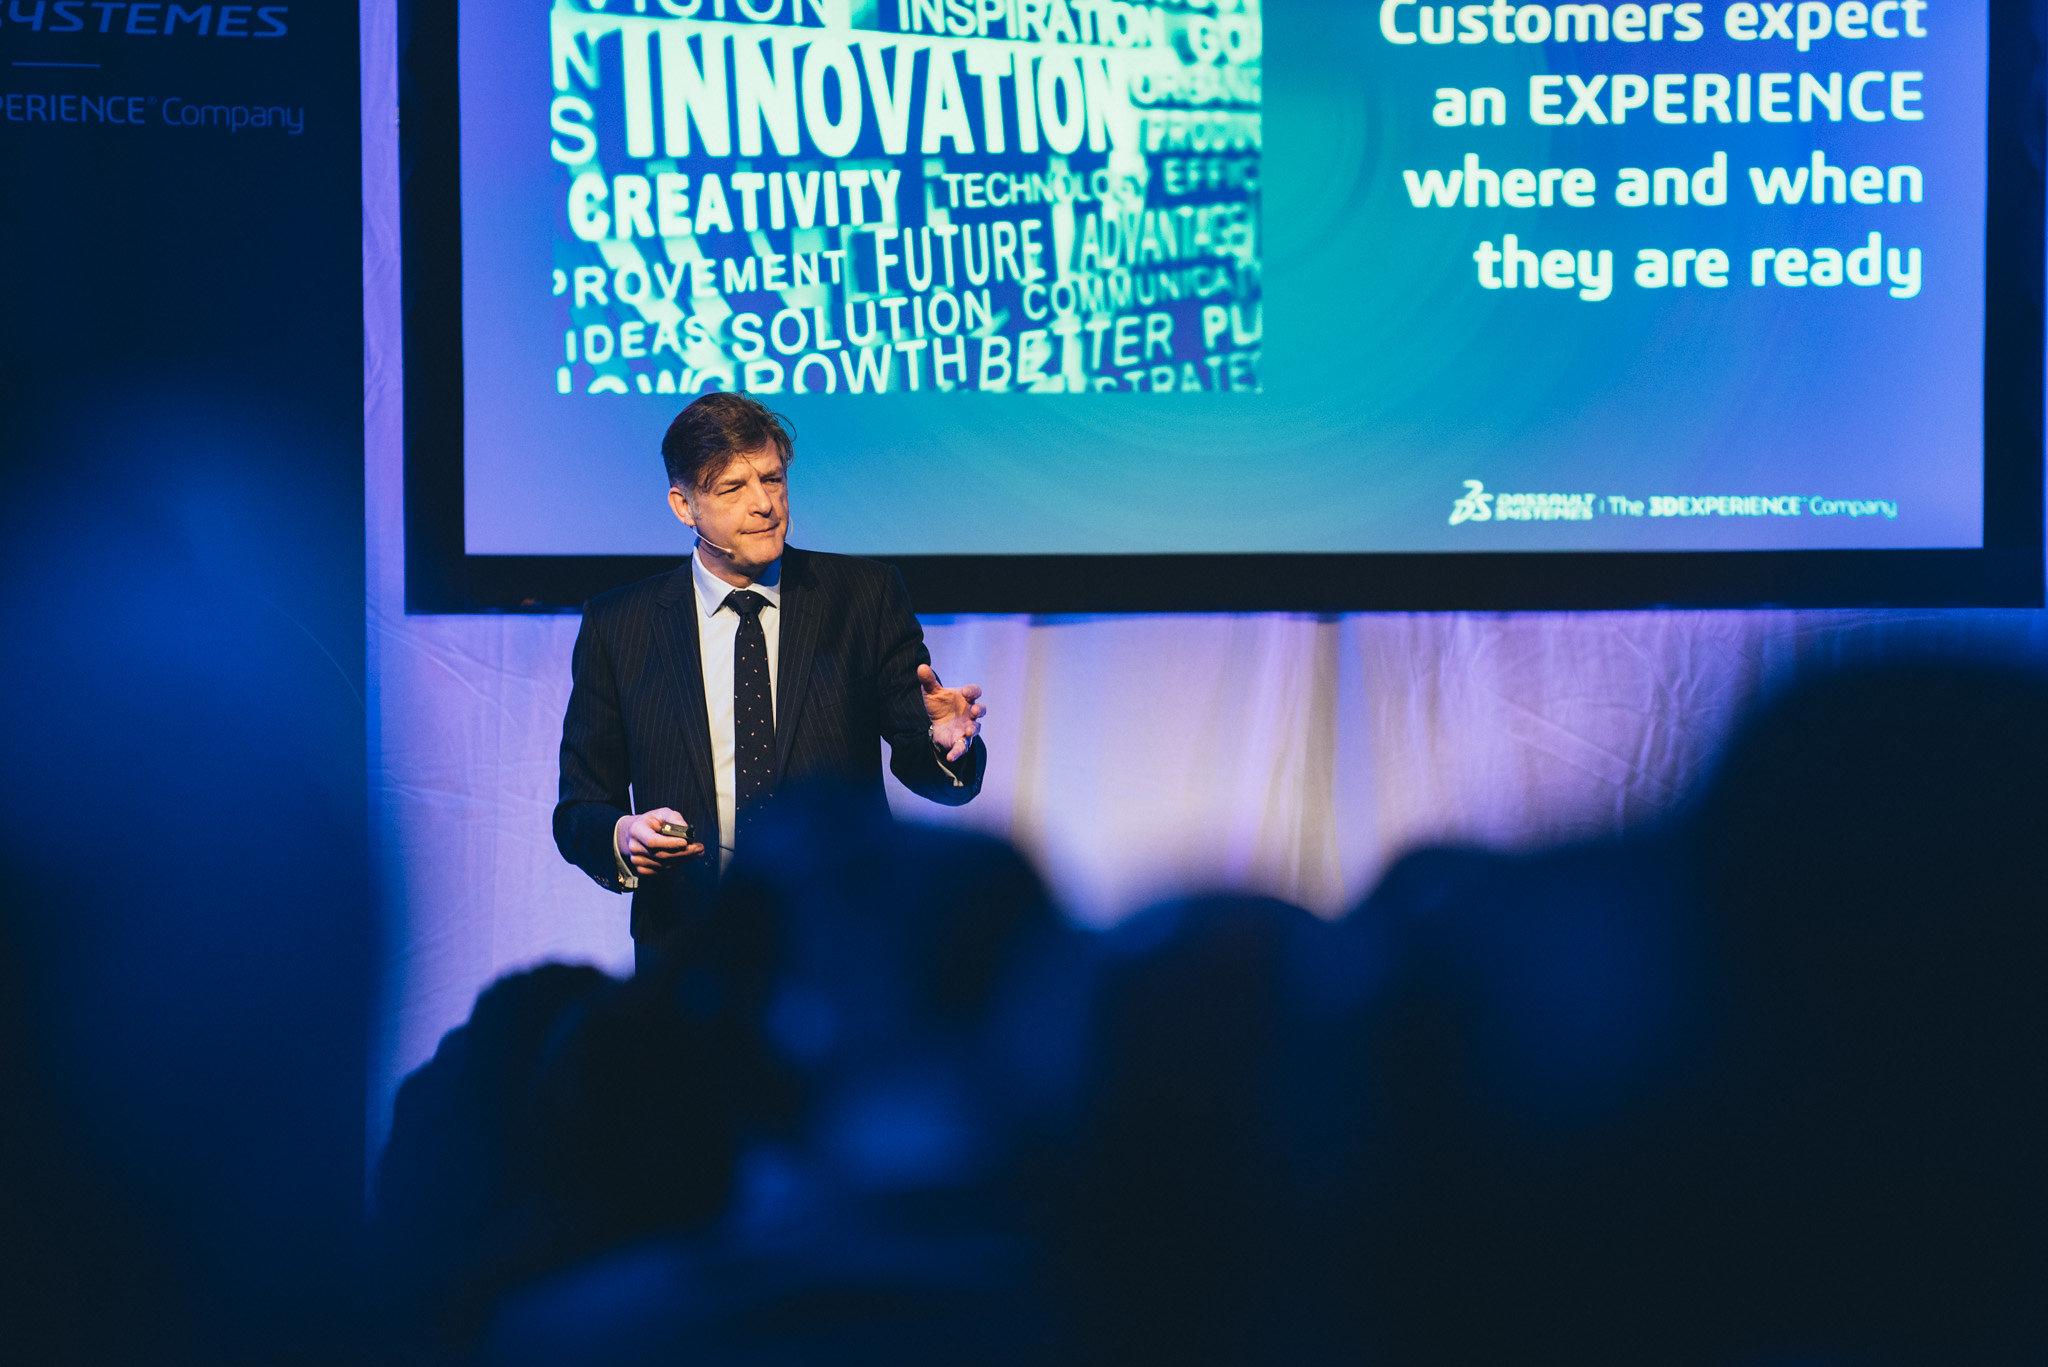 3DX_forum_event_highlights_rotterdam_presentations-18.jpg